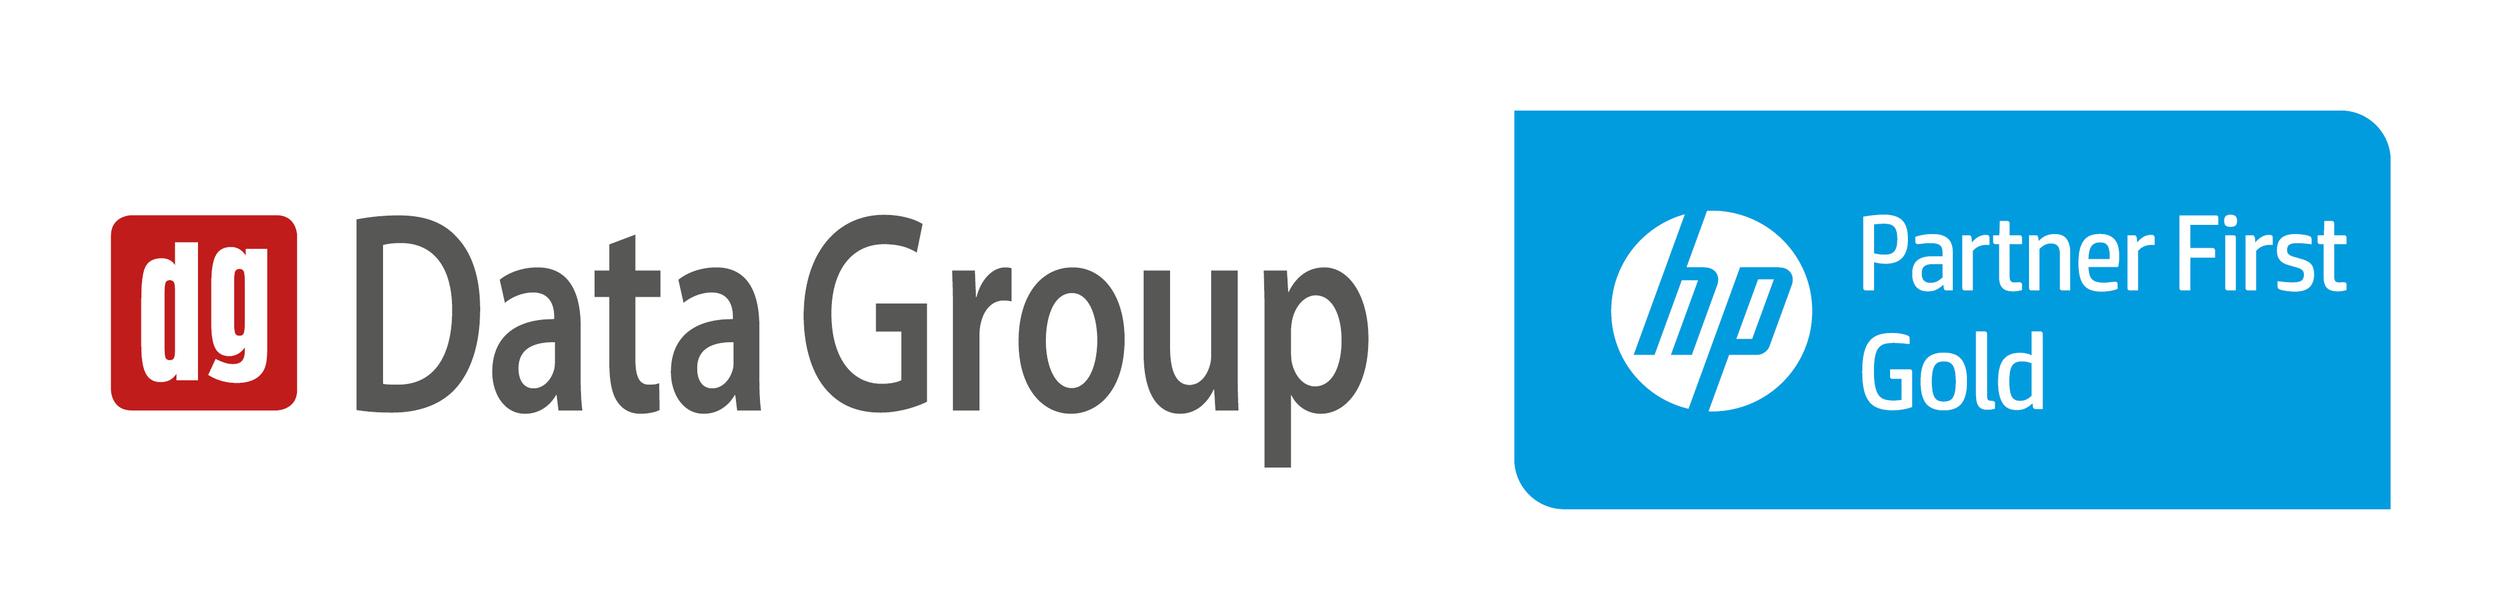 Data Group HP Partner First Gold lockup.jpg